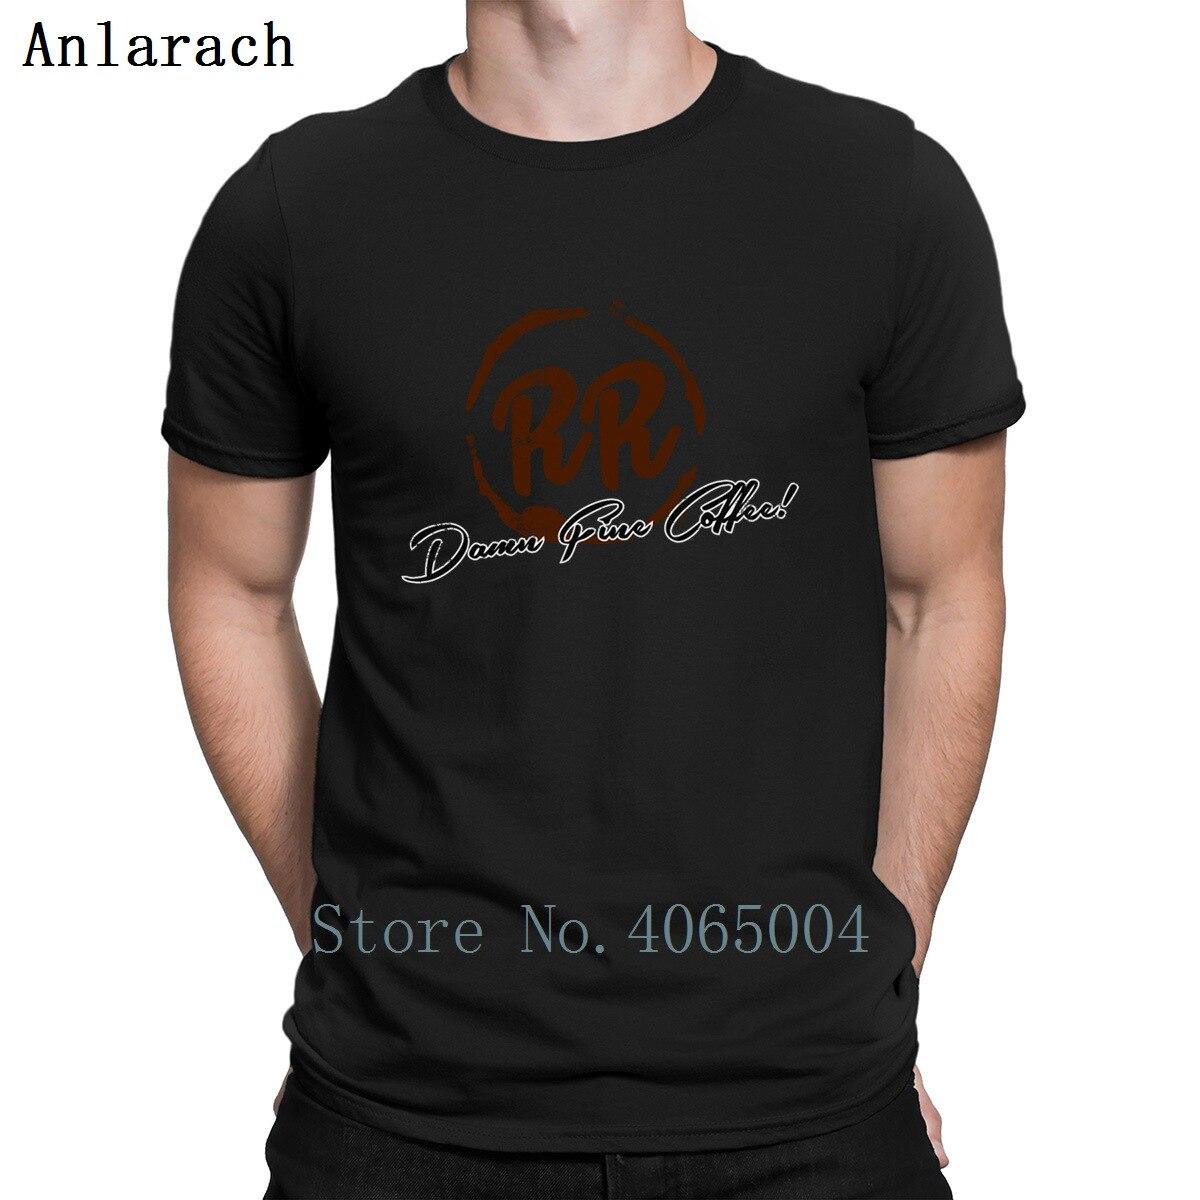 Twin Peaks doble comedor moda diseño de manga corta Camiseta de cuello redondo familia interesante camisa de verano